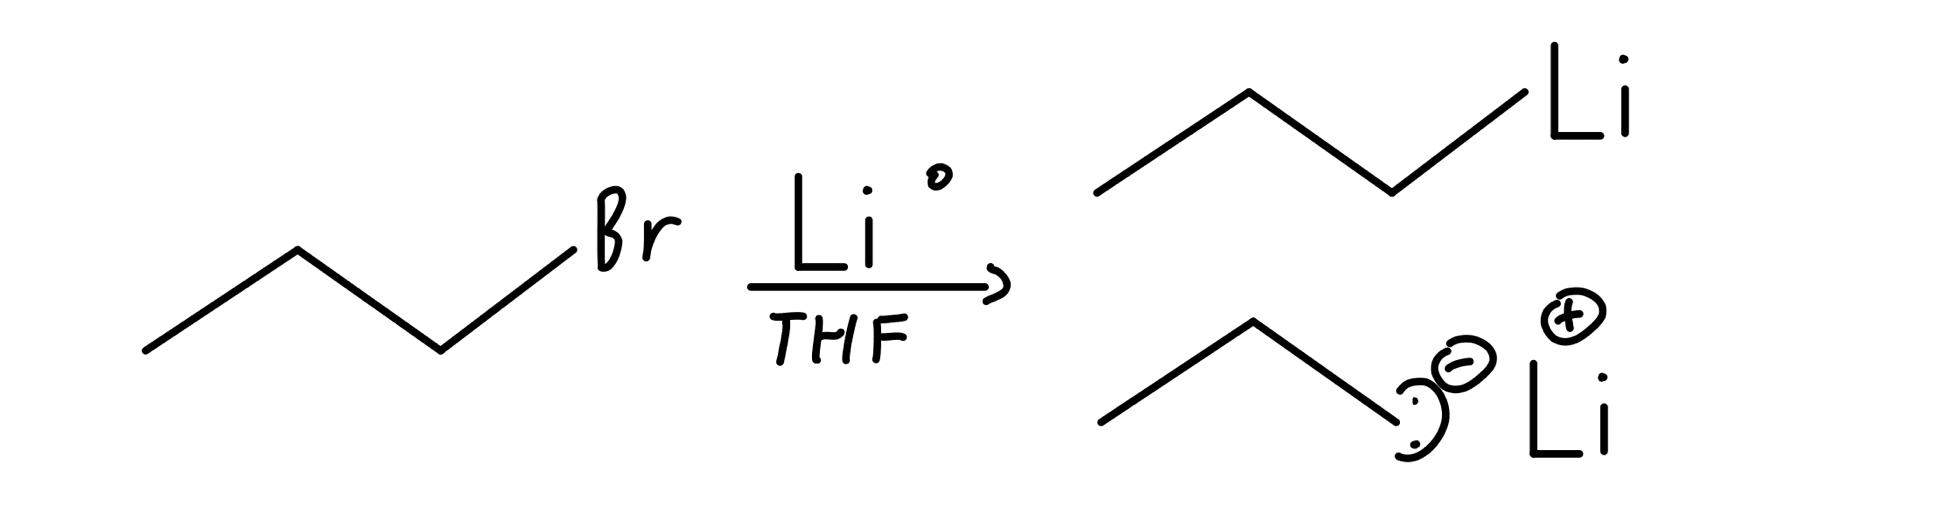 Creating an organolithium